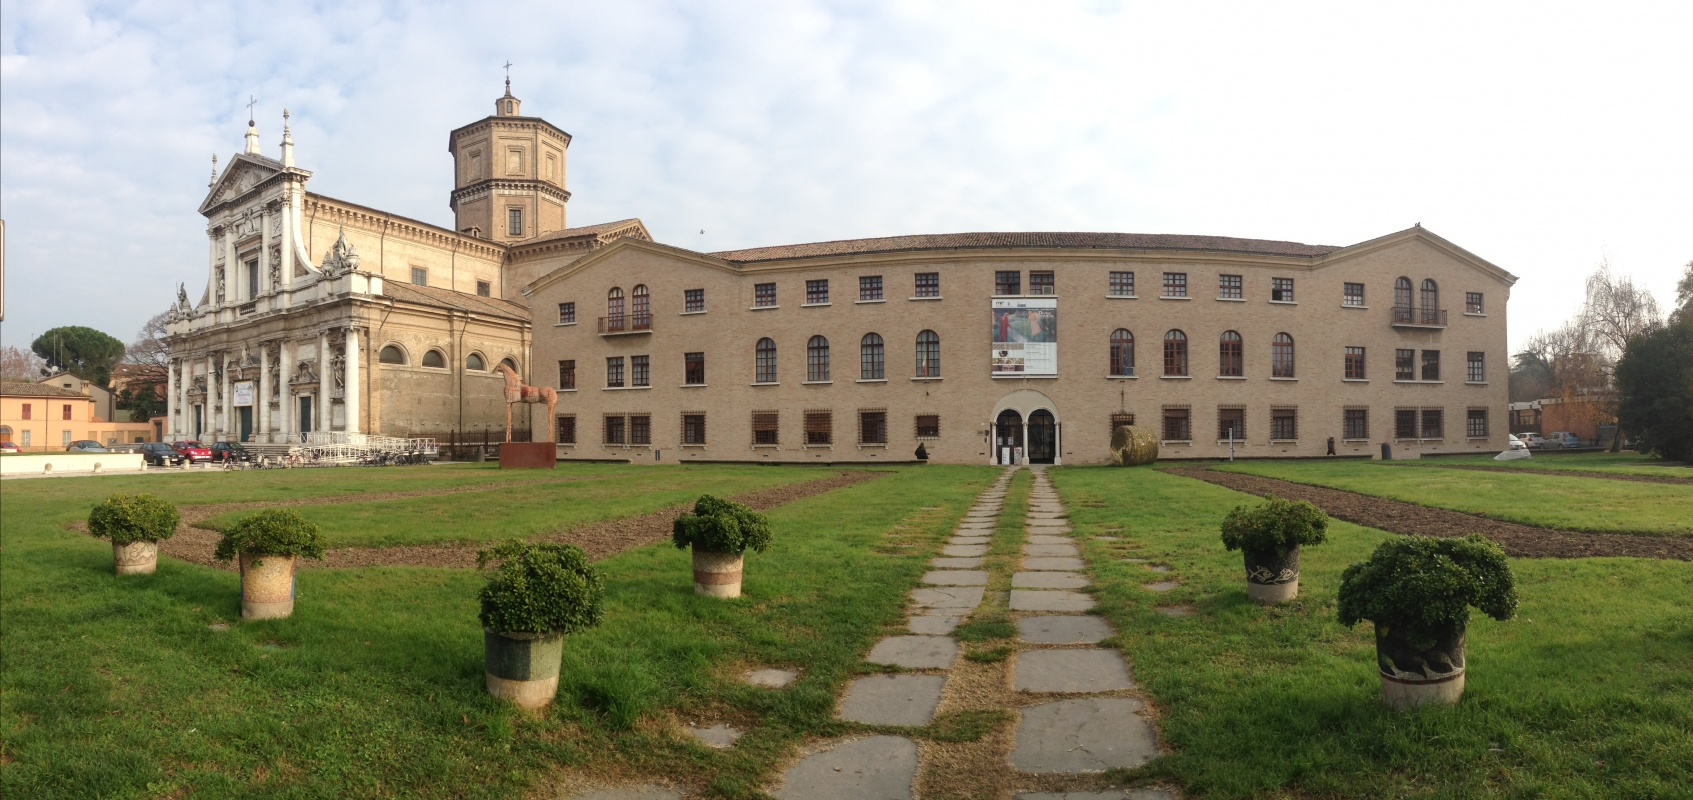 MAR 2 foto di C.Grassadonia - Chiara.Ravenna - Ravenna (RA)